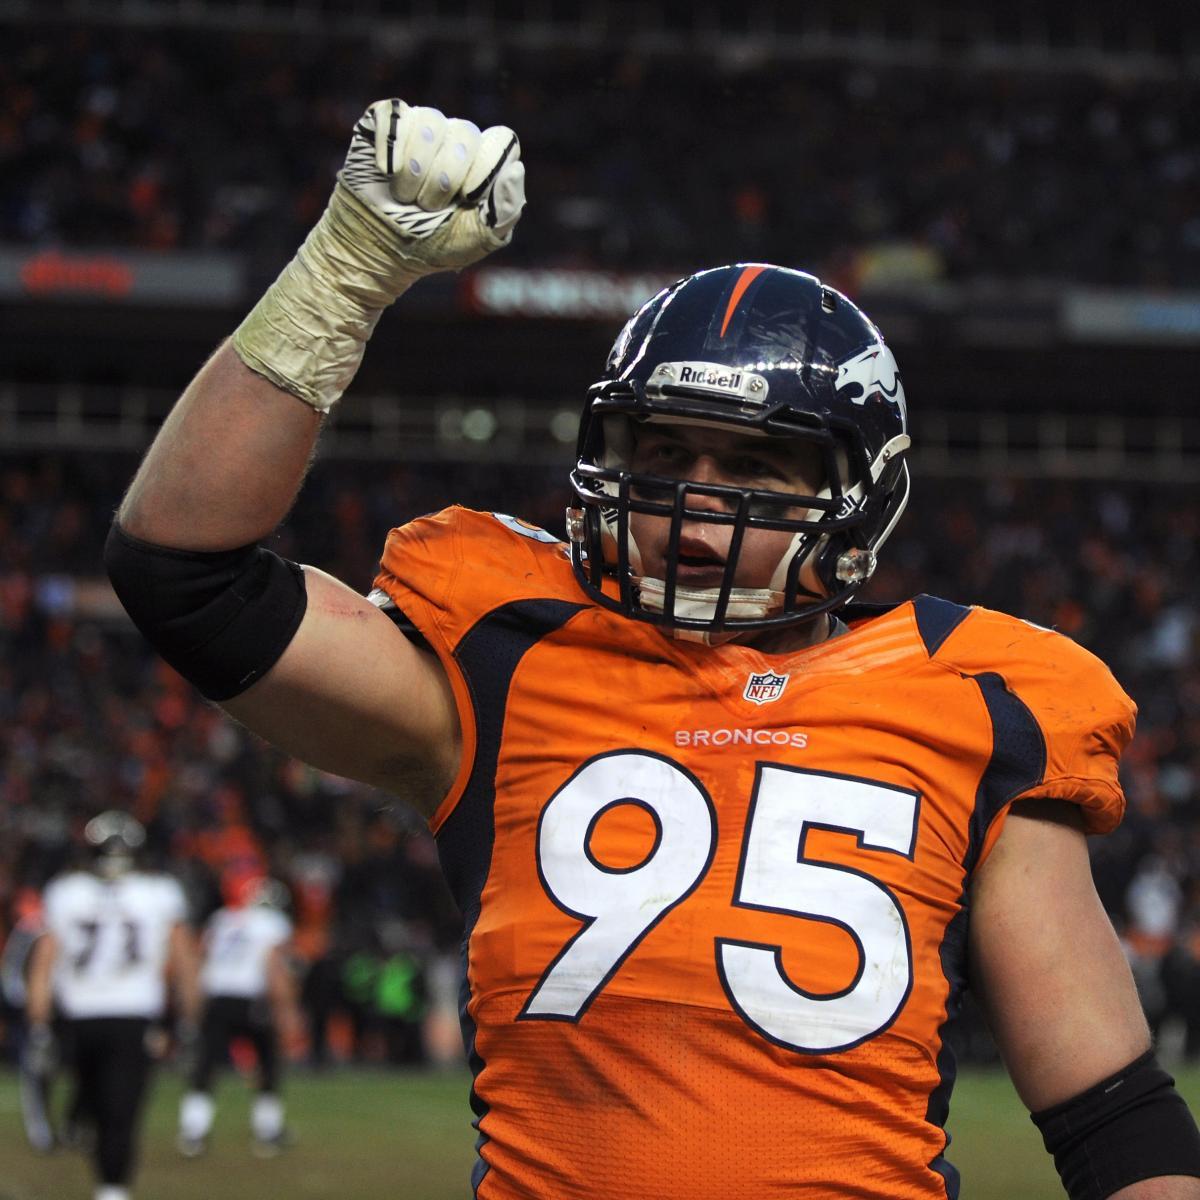 Broncos 2013 Draft Updates: Latest News, Trade Rumors